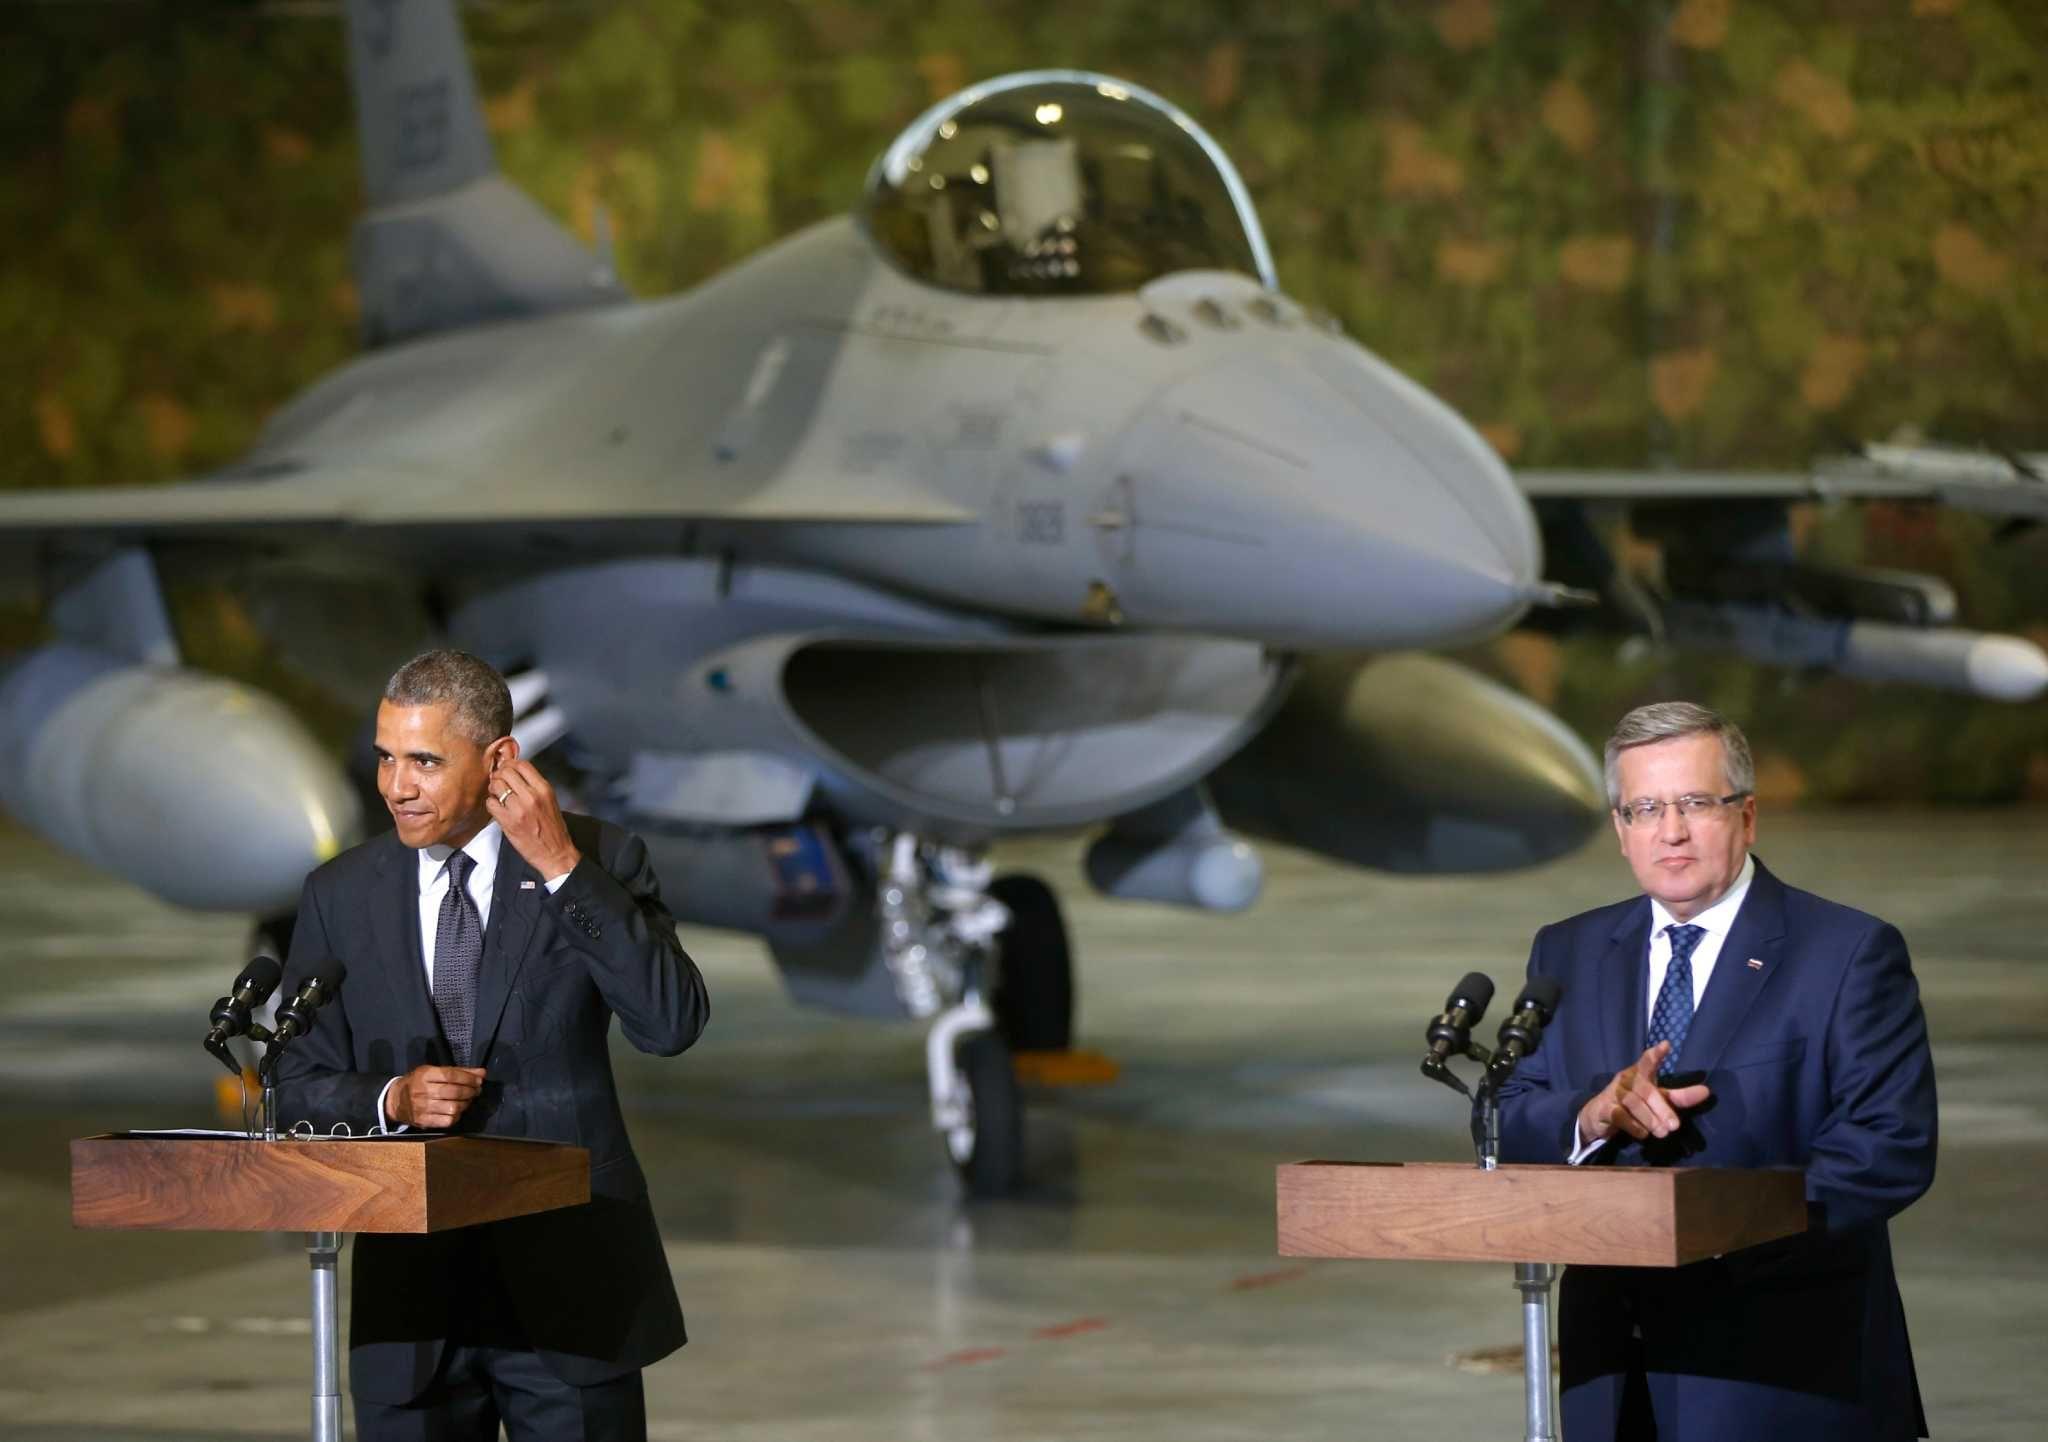 Obama+boosting+America's+military+effort+in+Europe